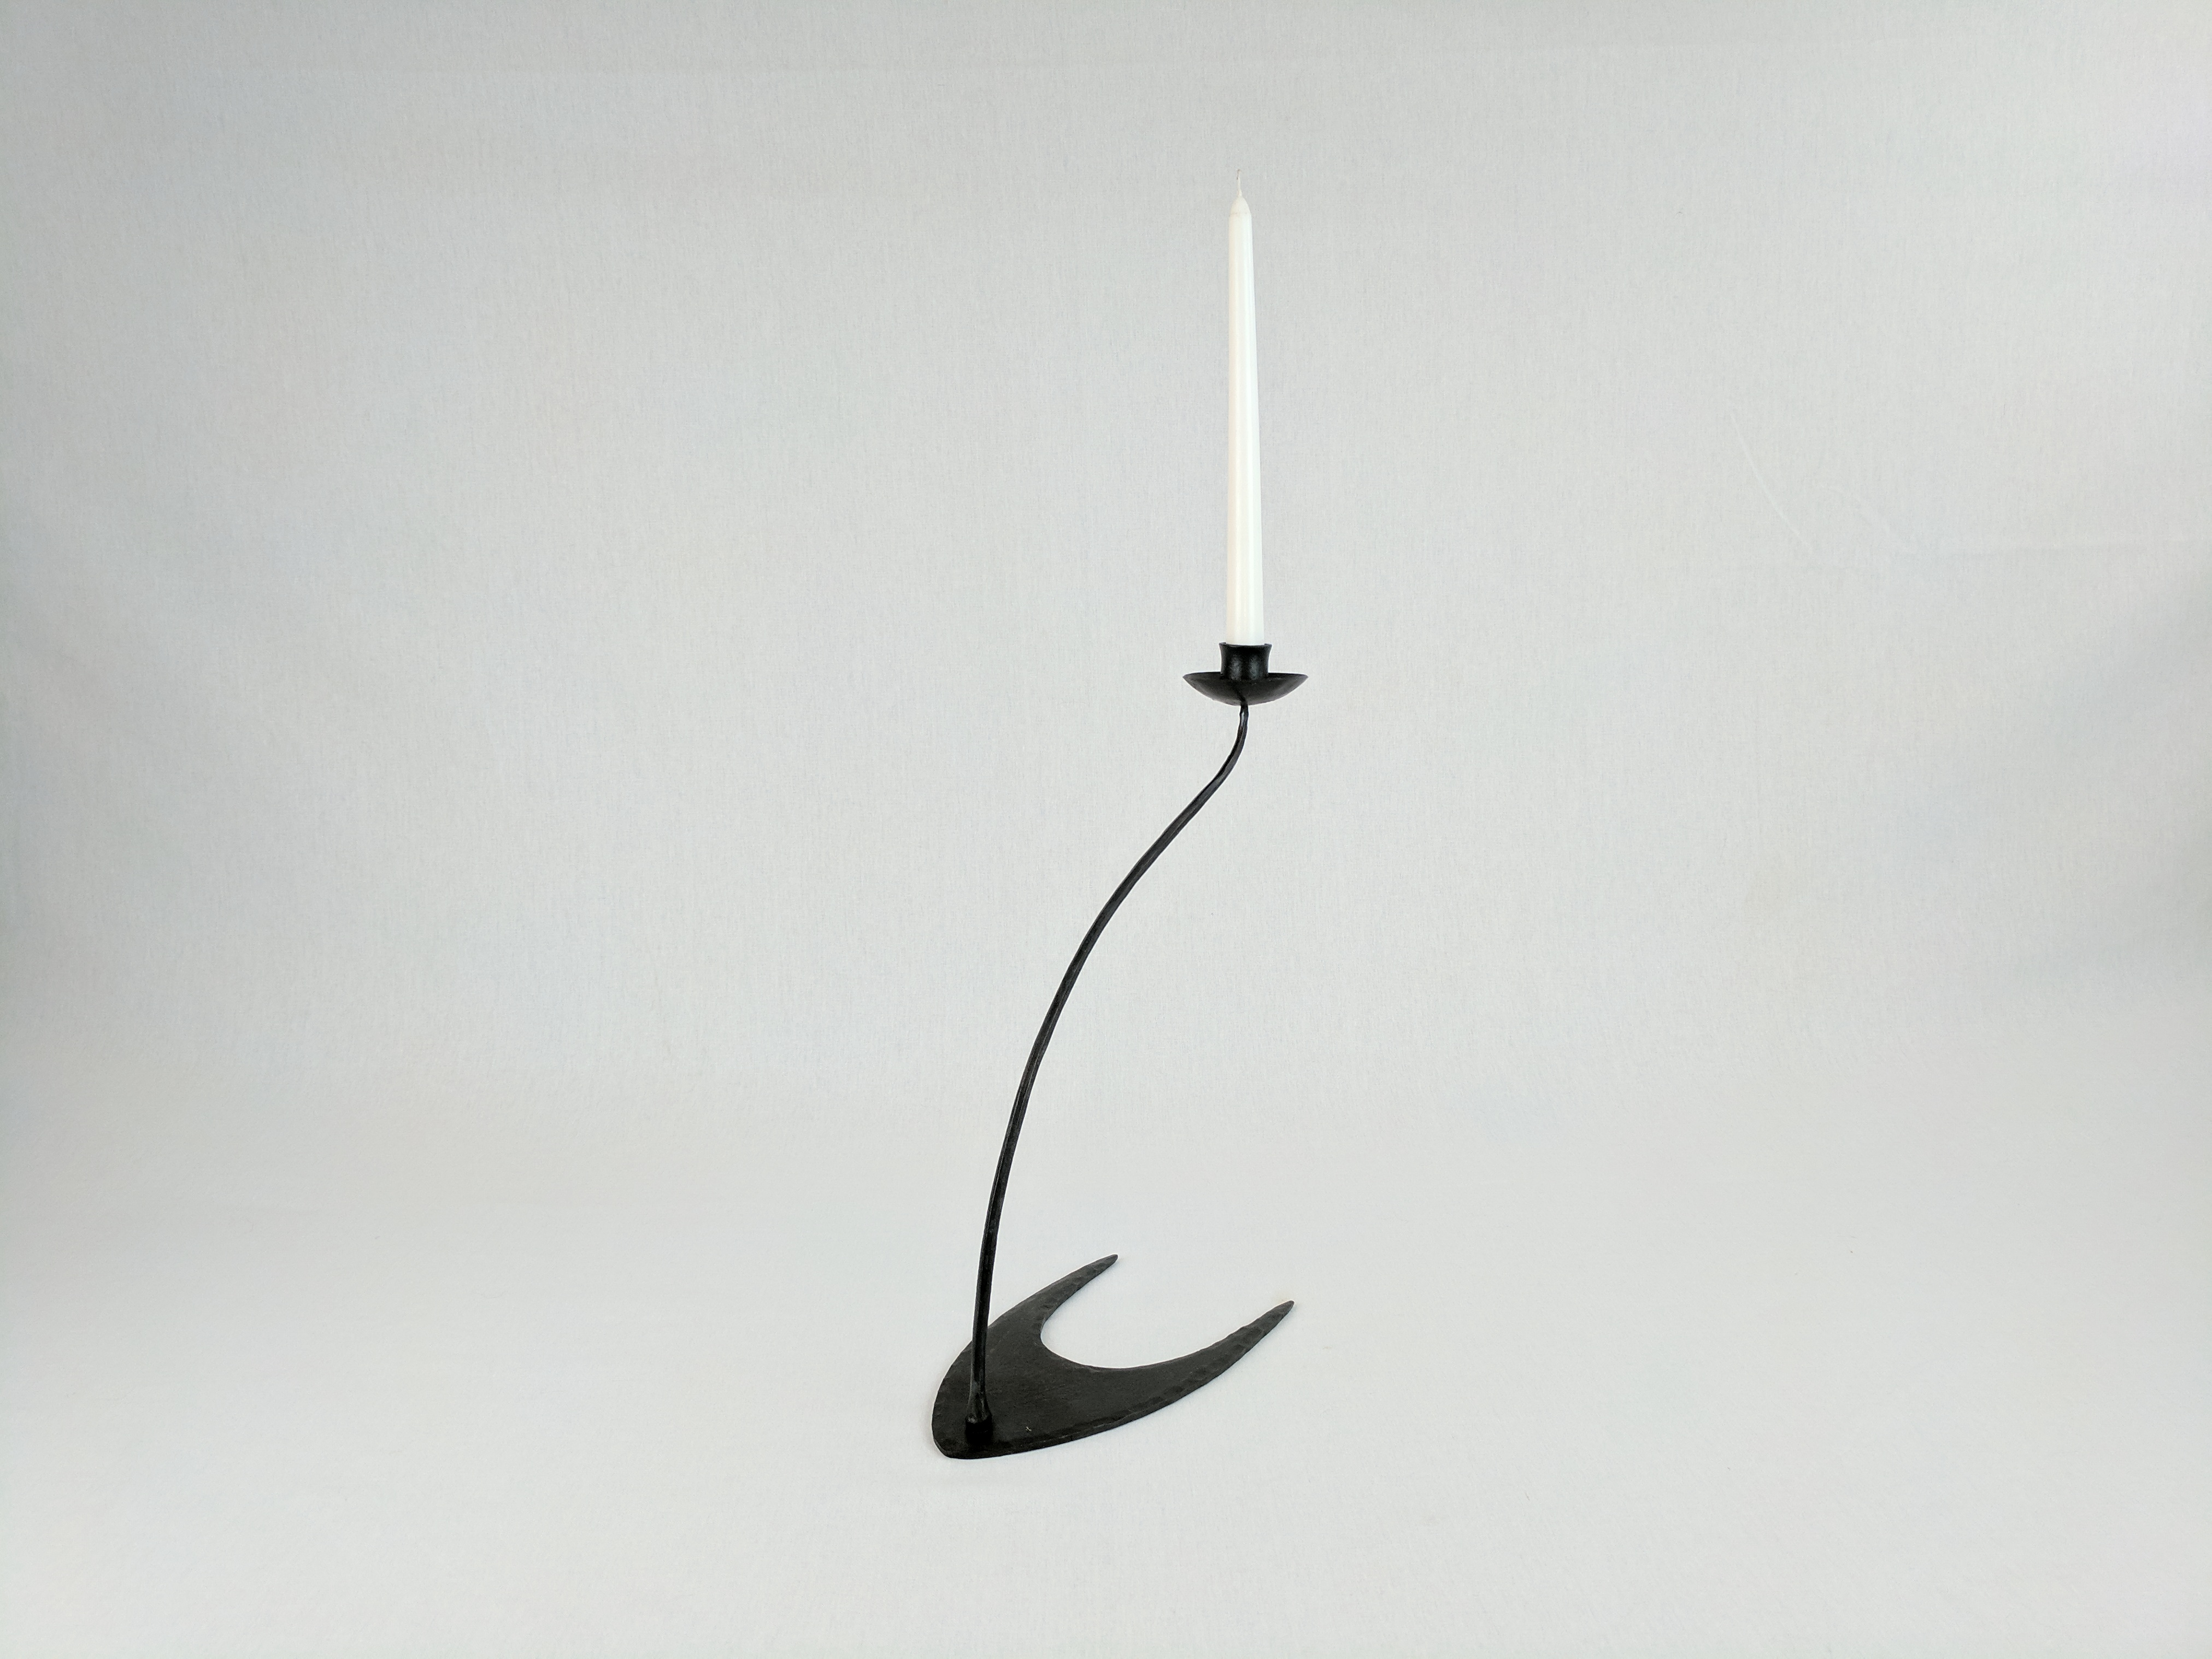 Slimline forged candlestick